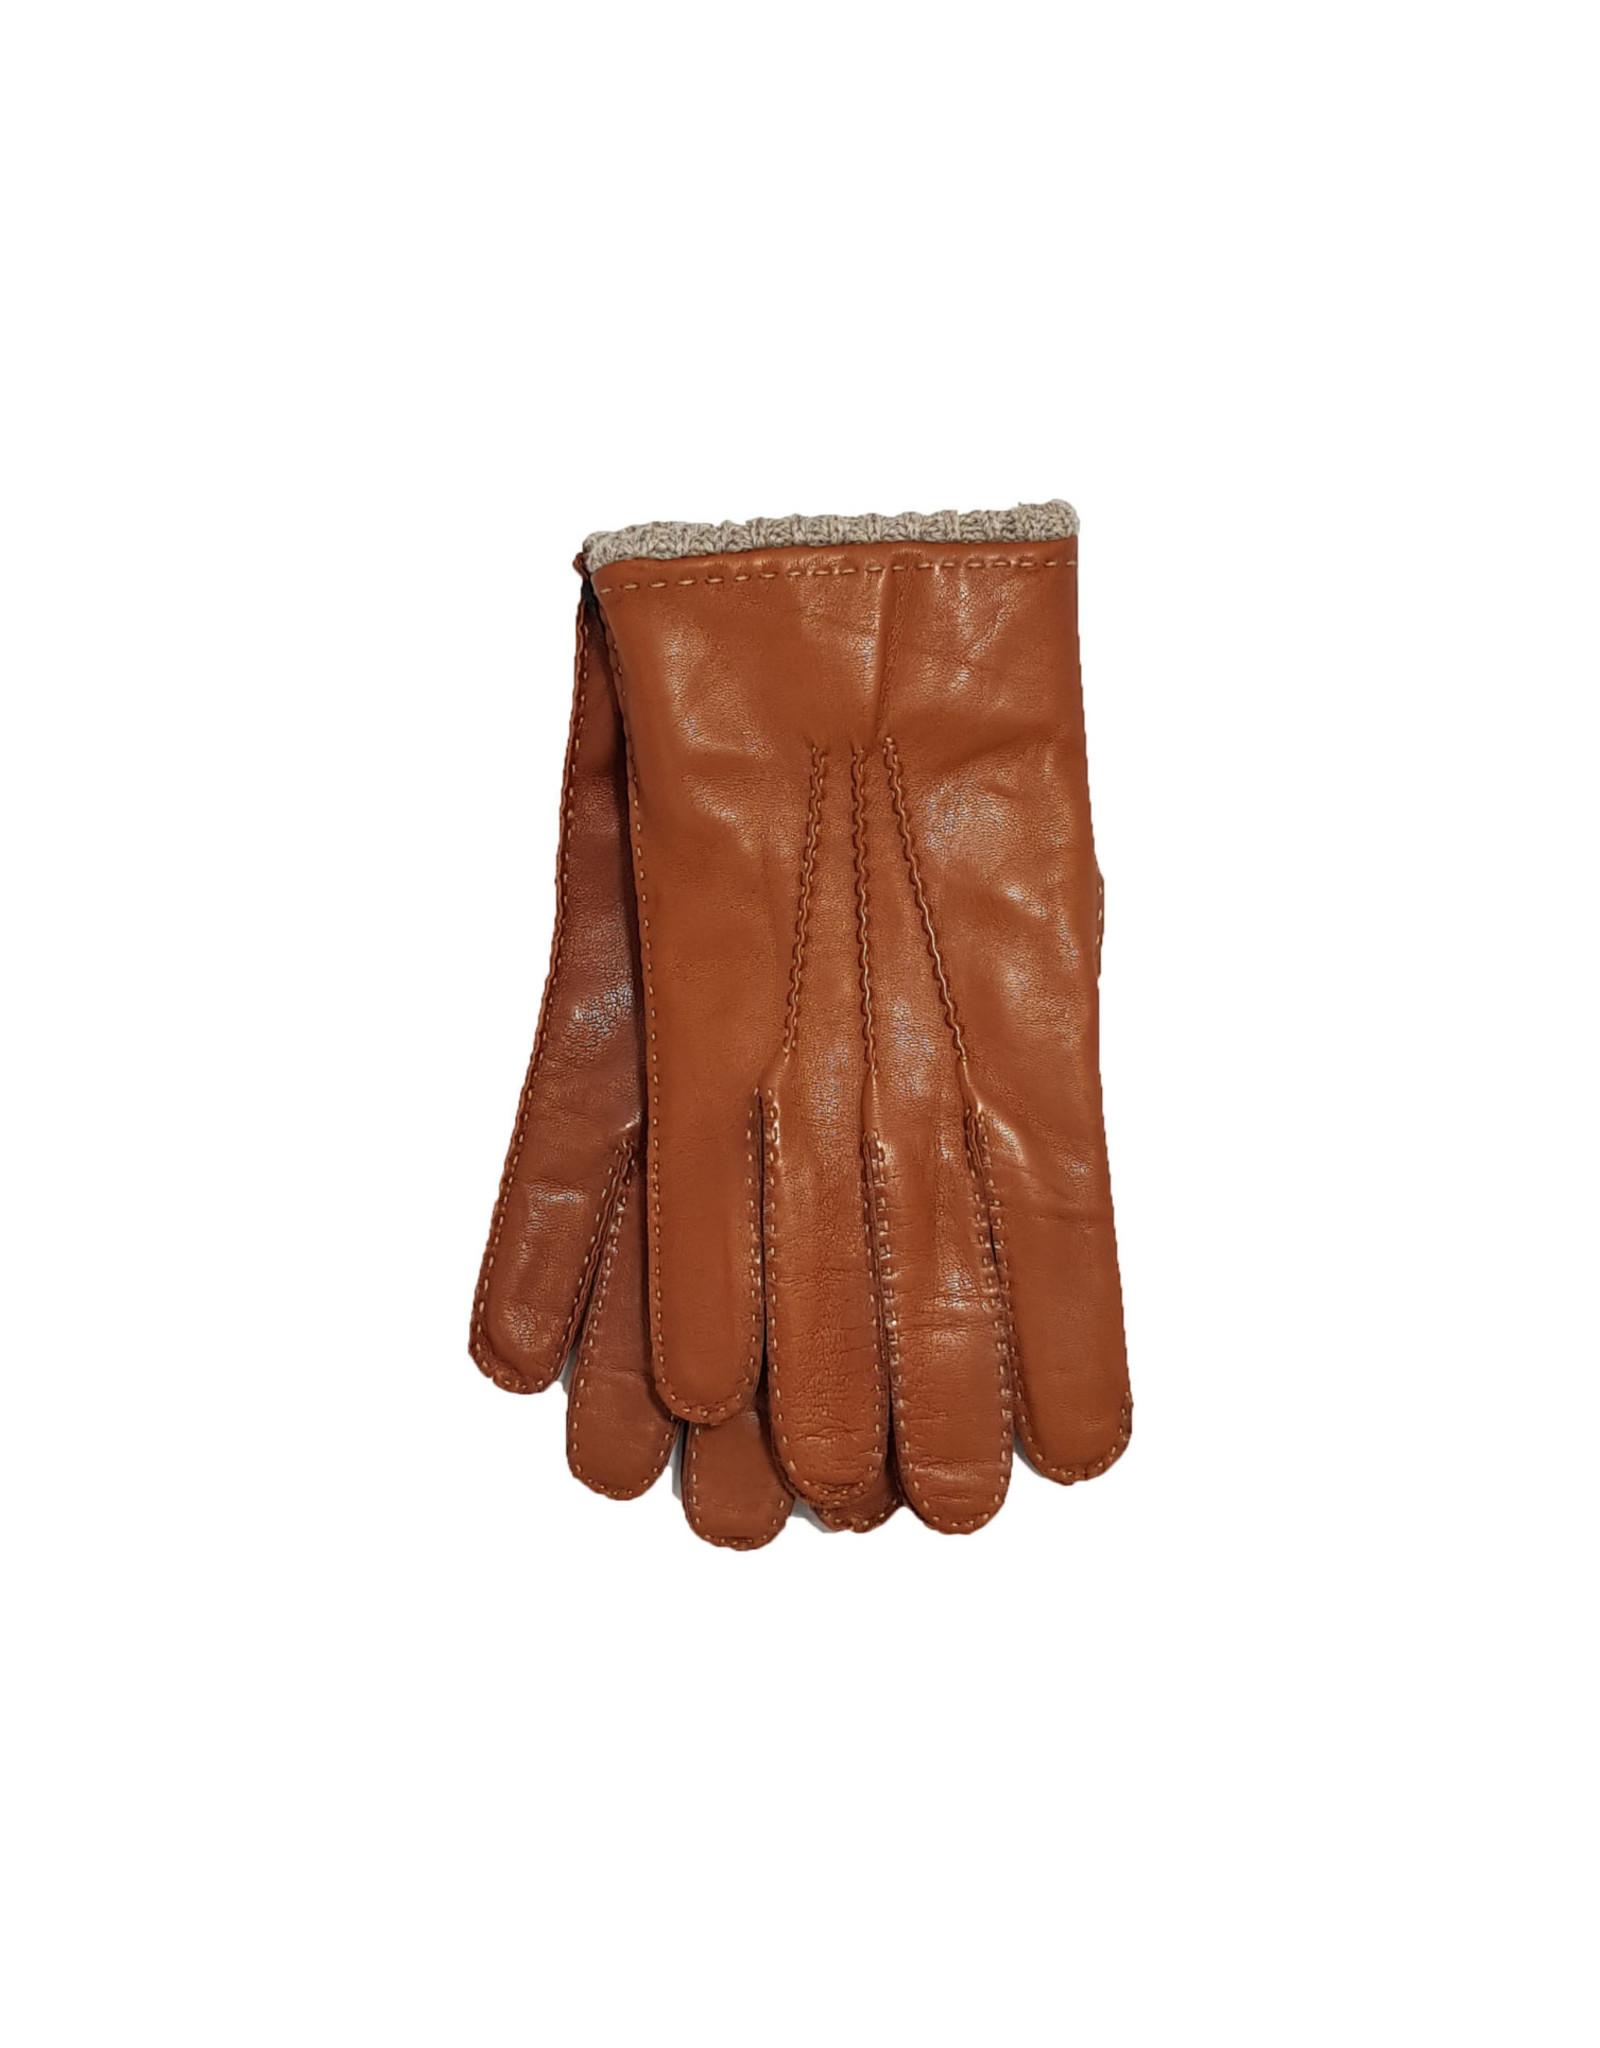 Mazzoleni Mazzoleni handschoenen leder camel 904/13